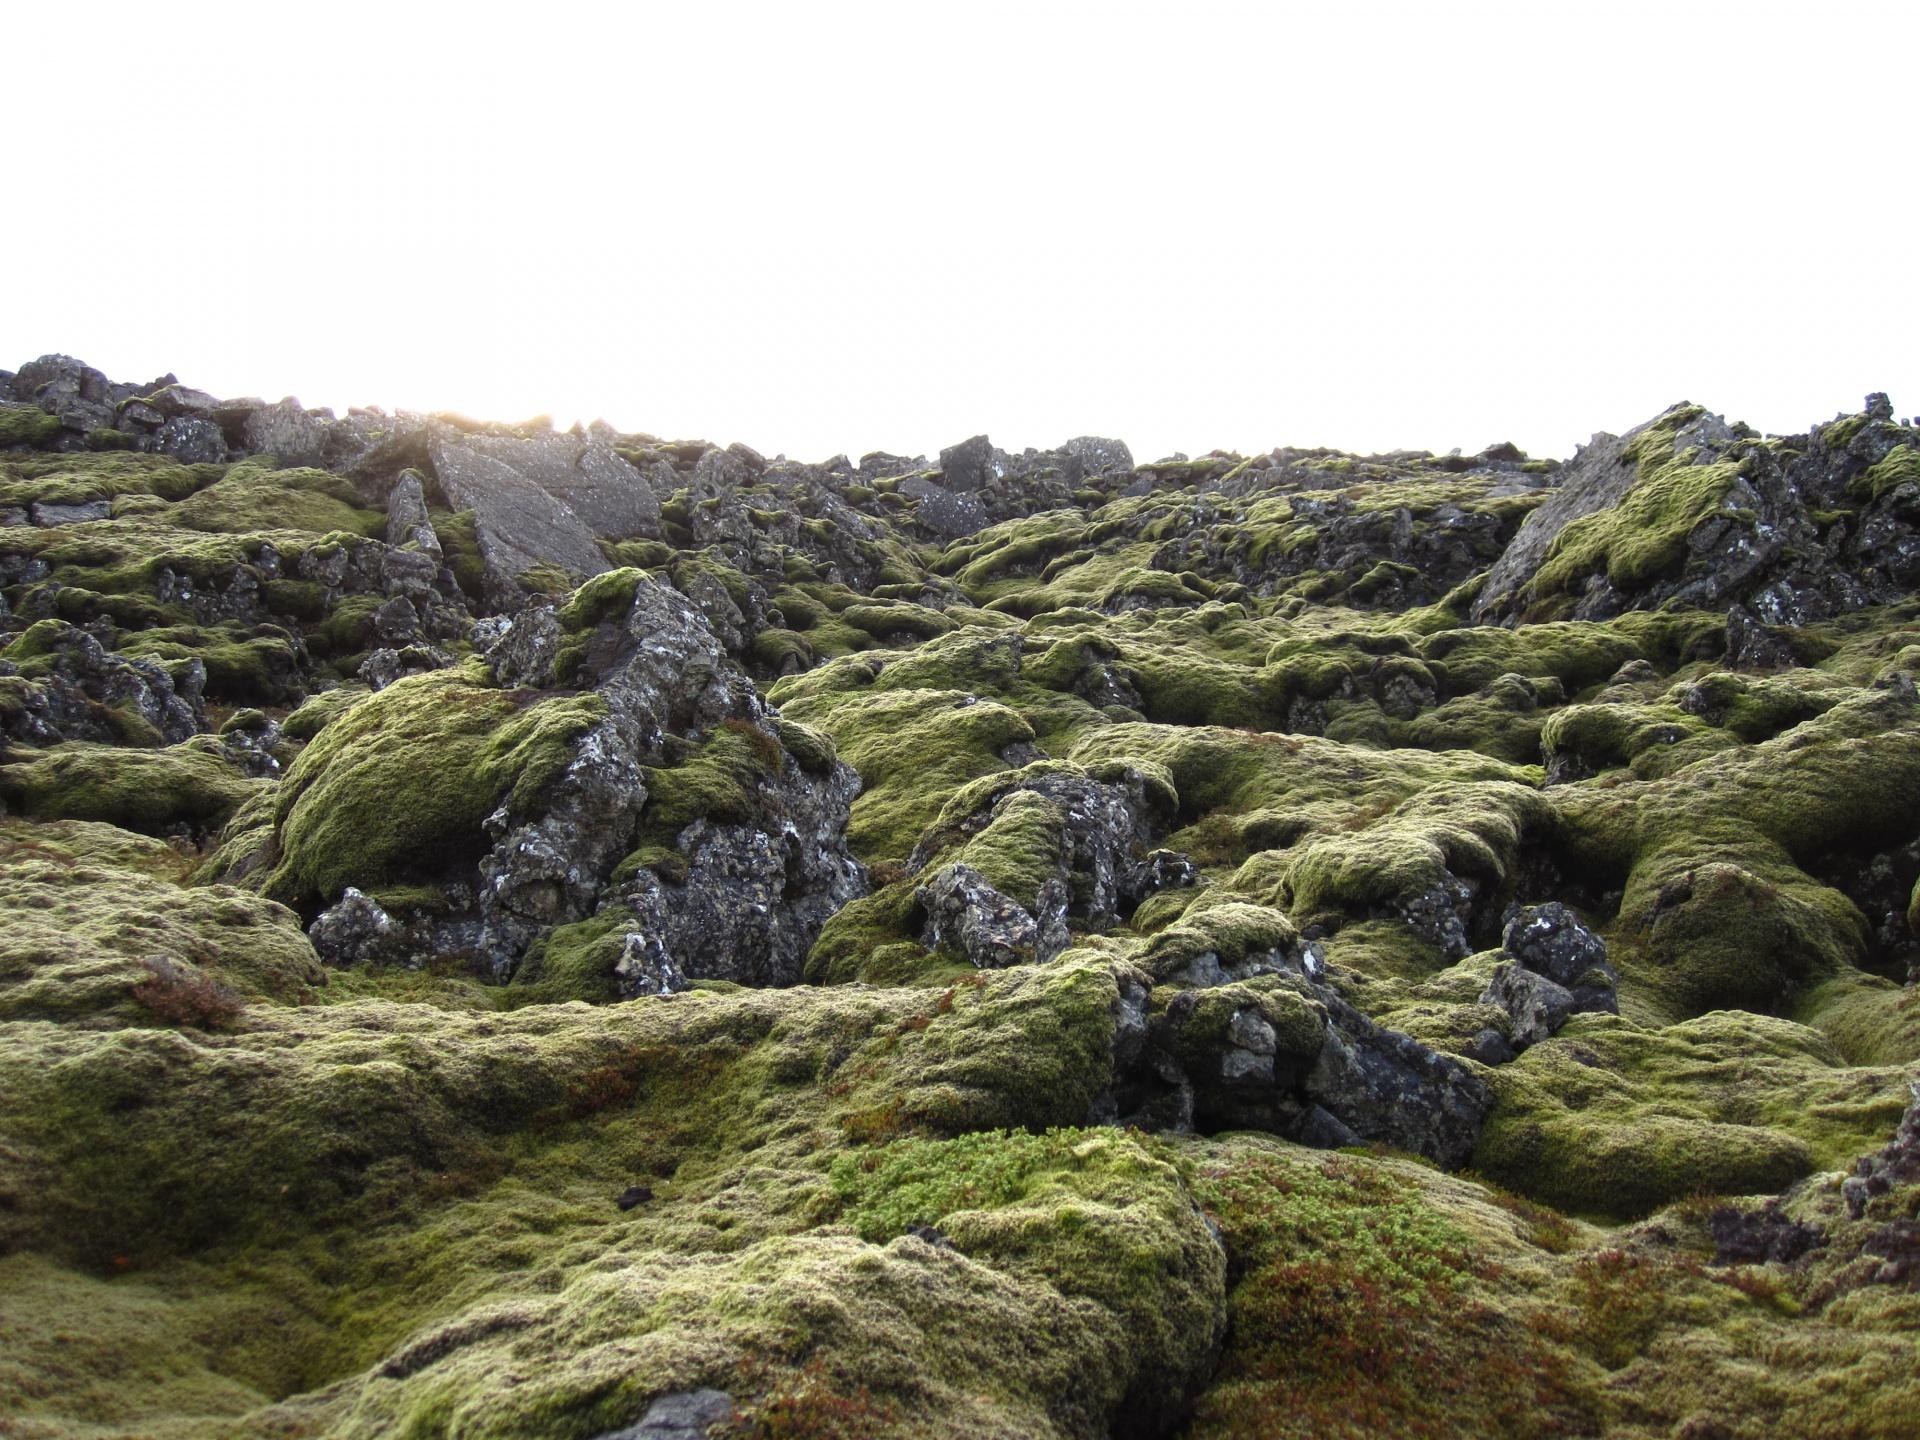 Iceland rocky Landscape Wallpaper 1920x1440